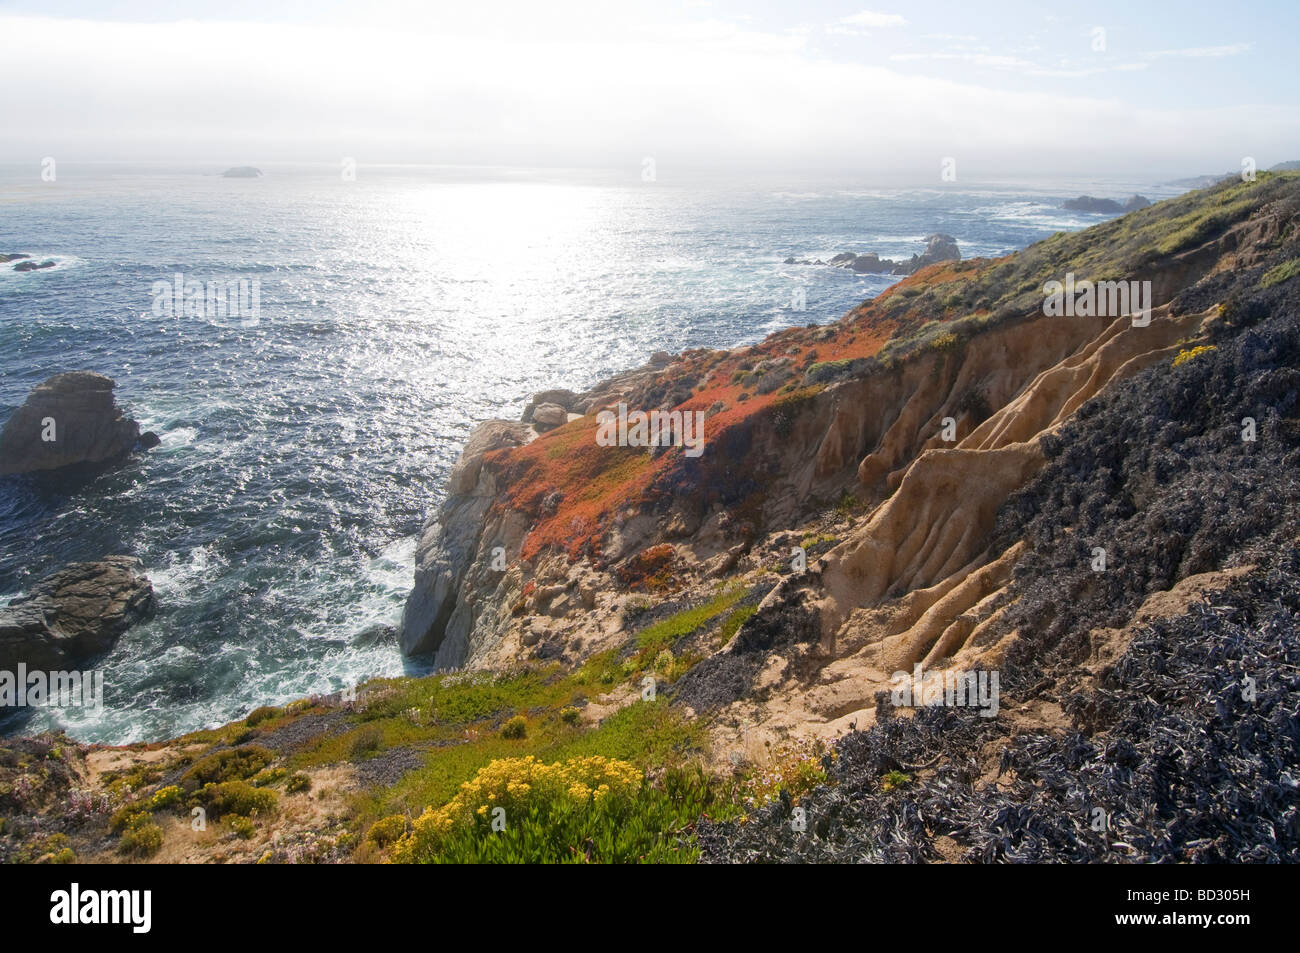 Wildflowers along the rocky coast of Big Sur California - Stock Image